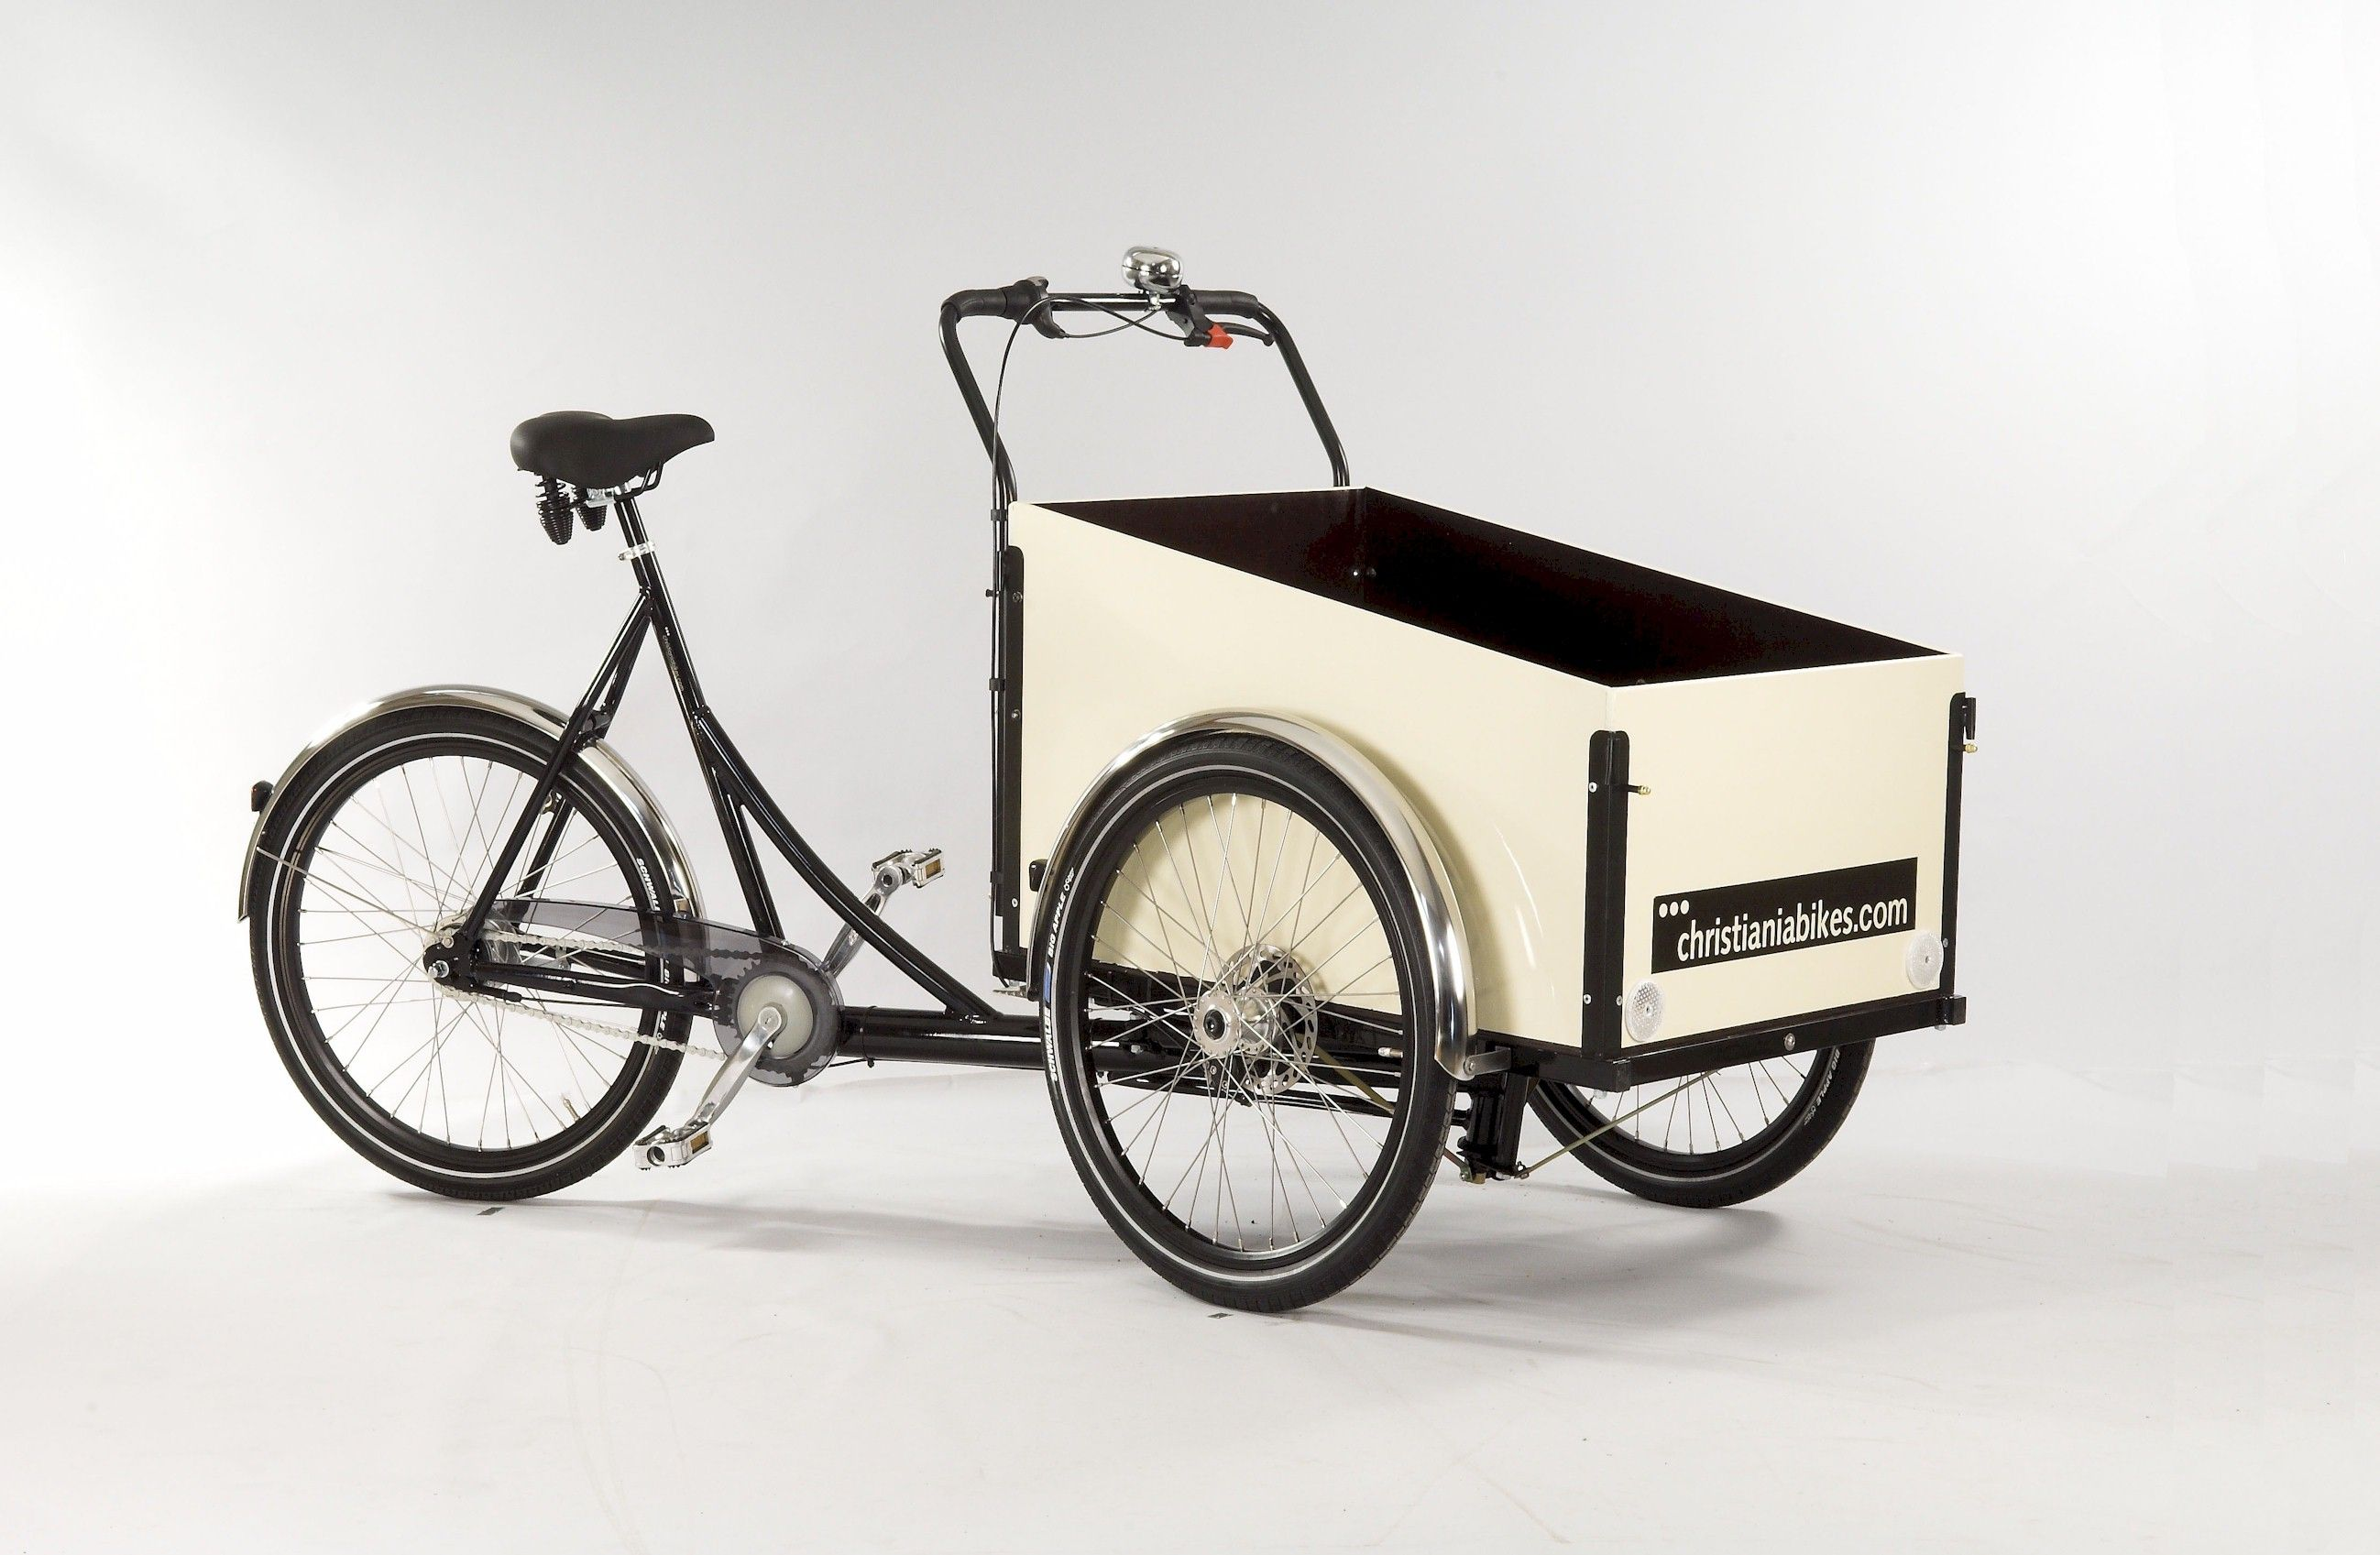 Christiania Bikes Cargo Bike Christiania Bike Electric Cargo Bike